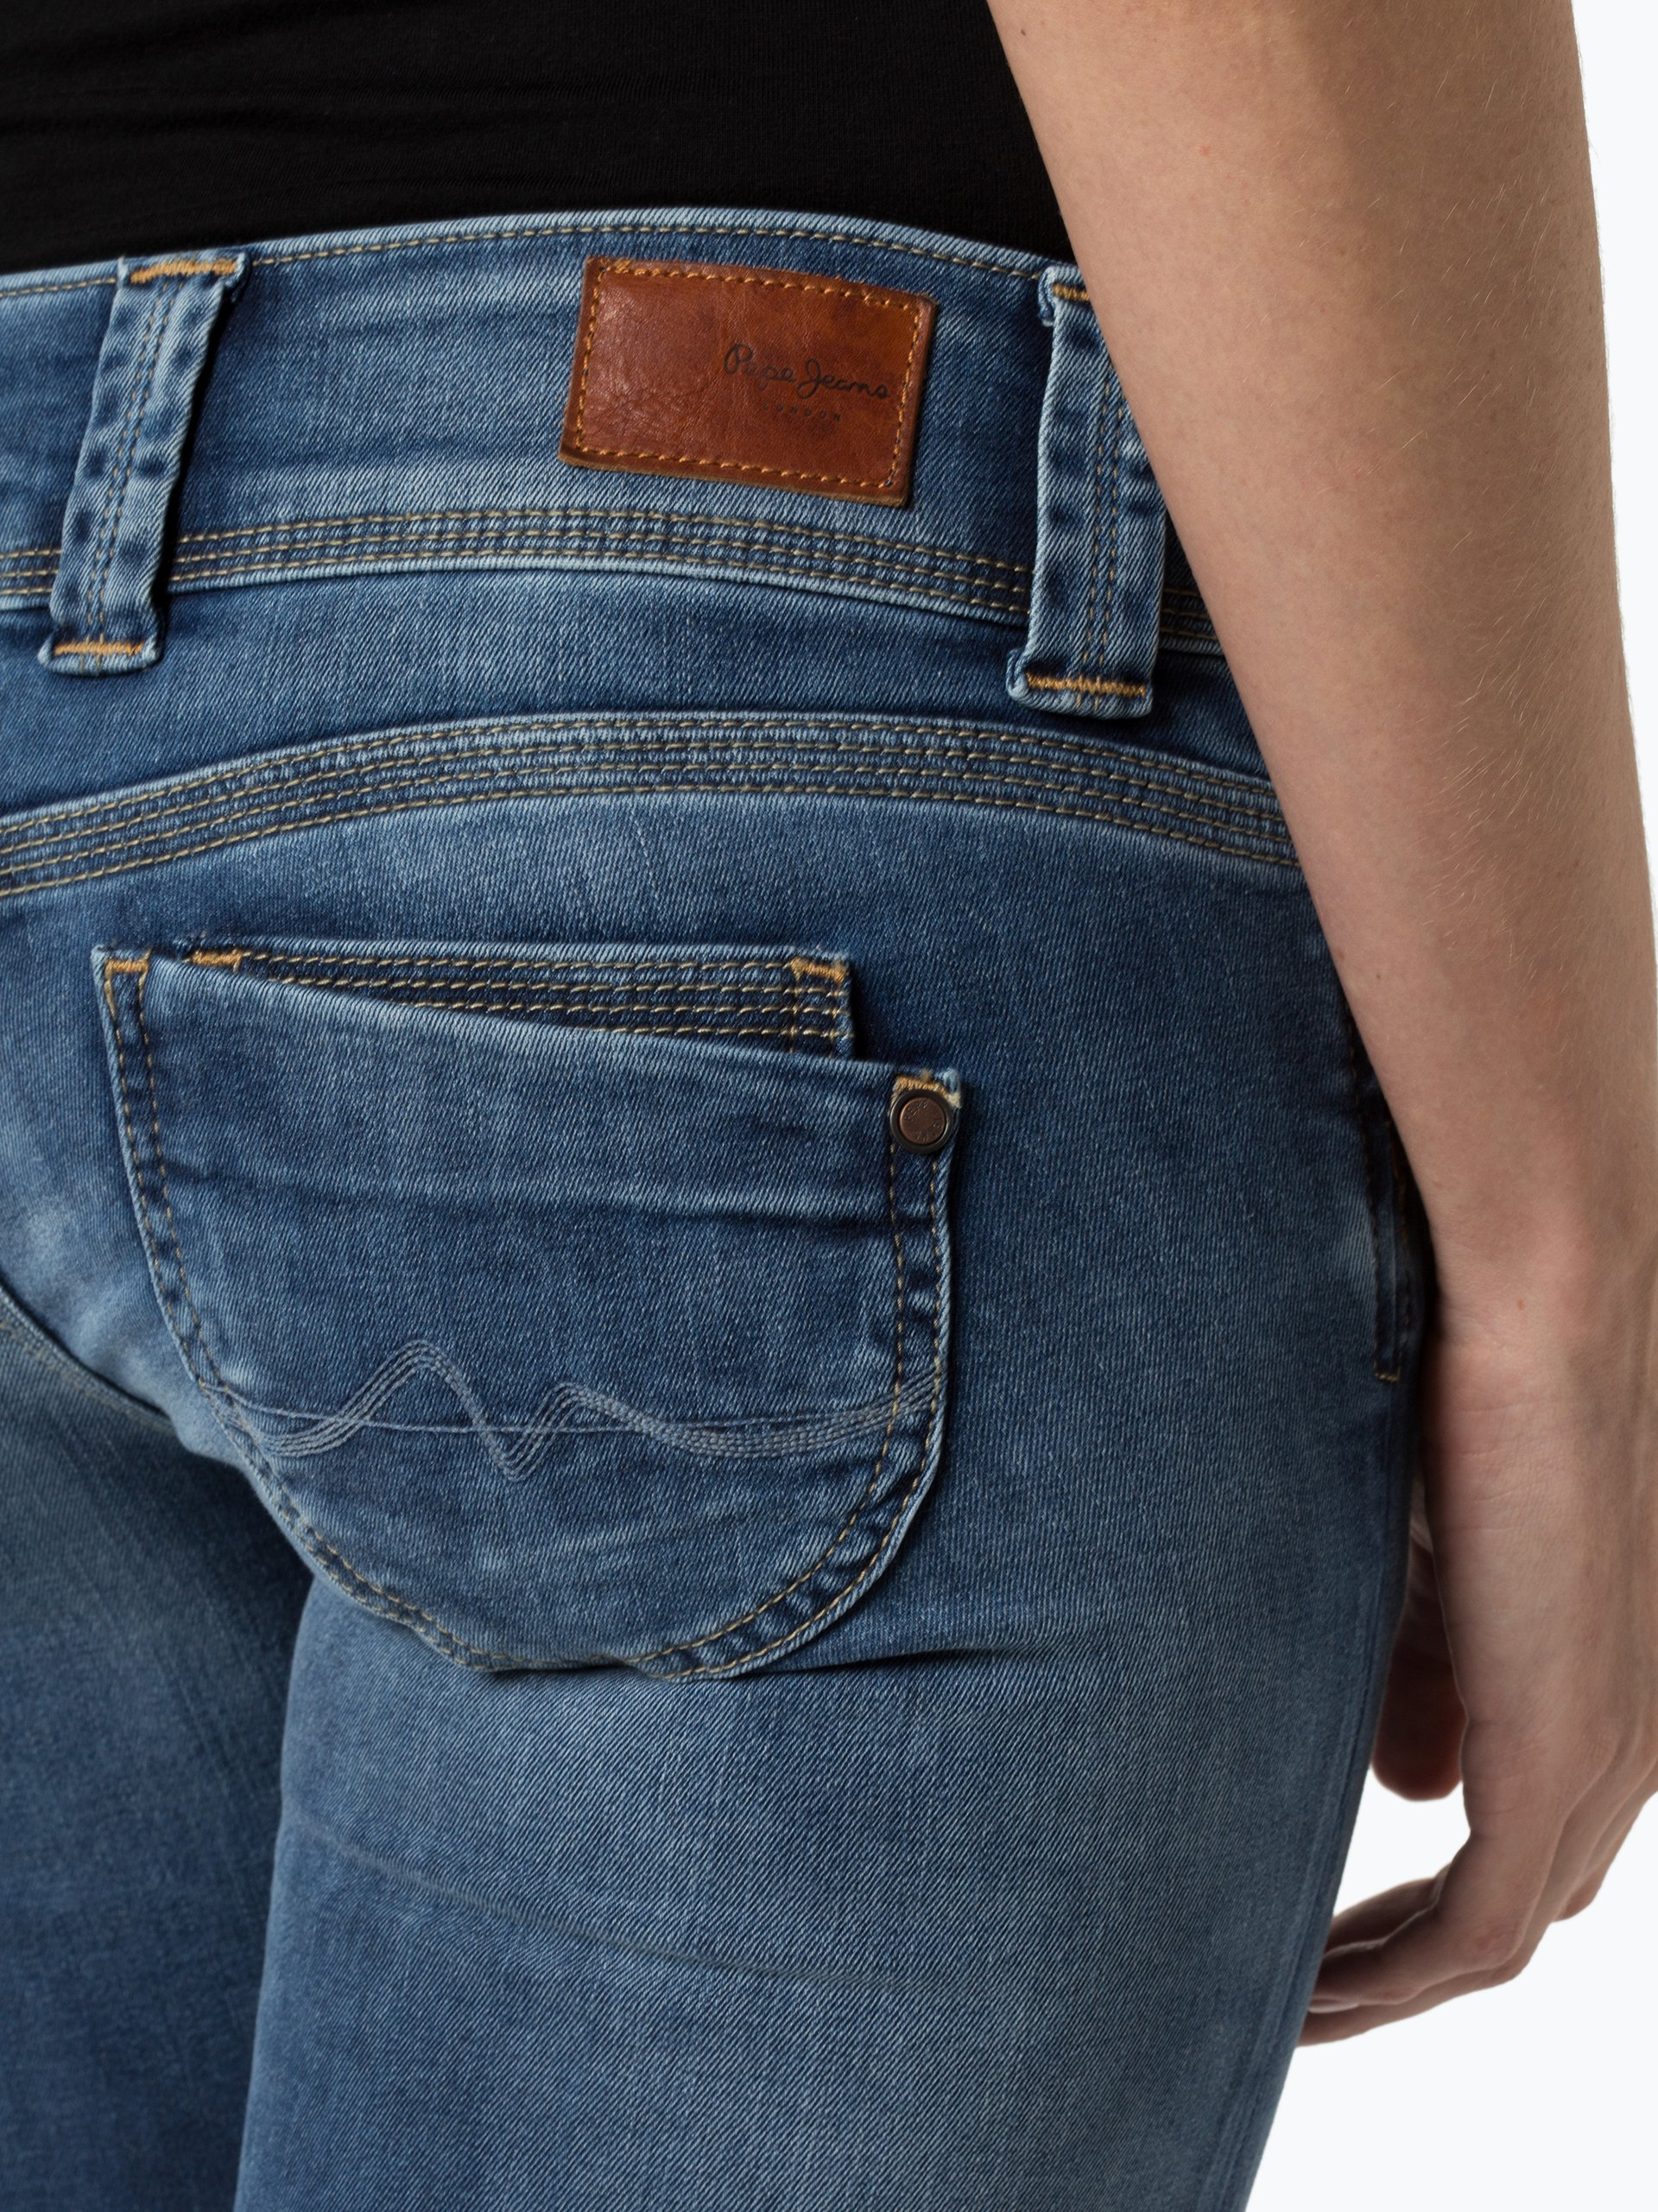 Pepe Jeans Damen Jeans - Venus